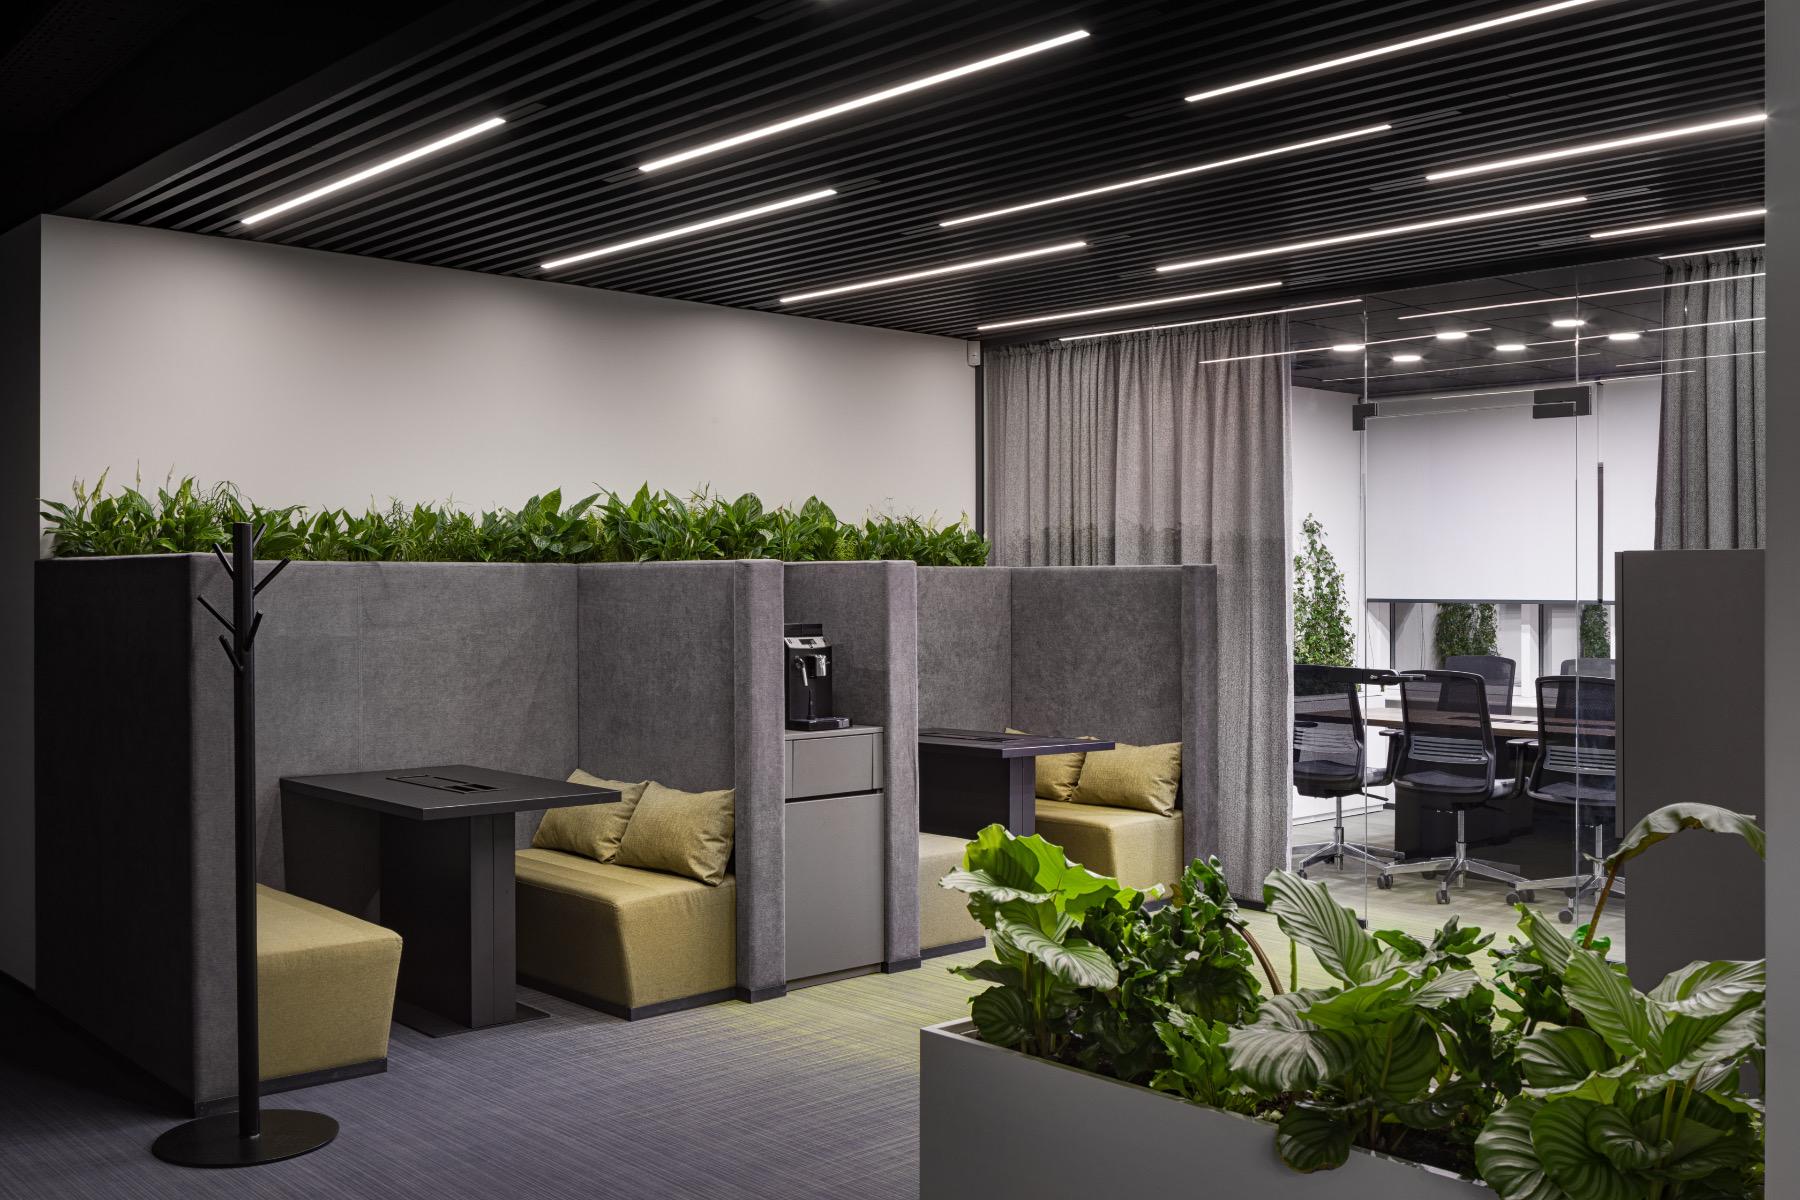 privat-bank-kyiv-office-26